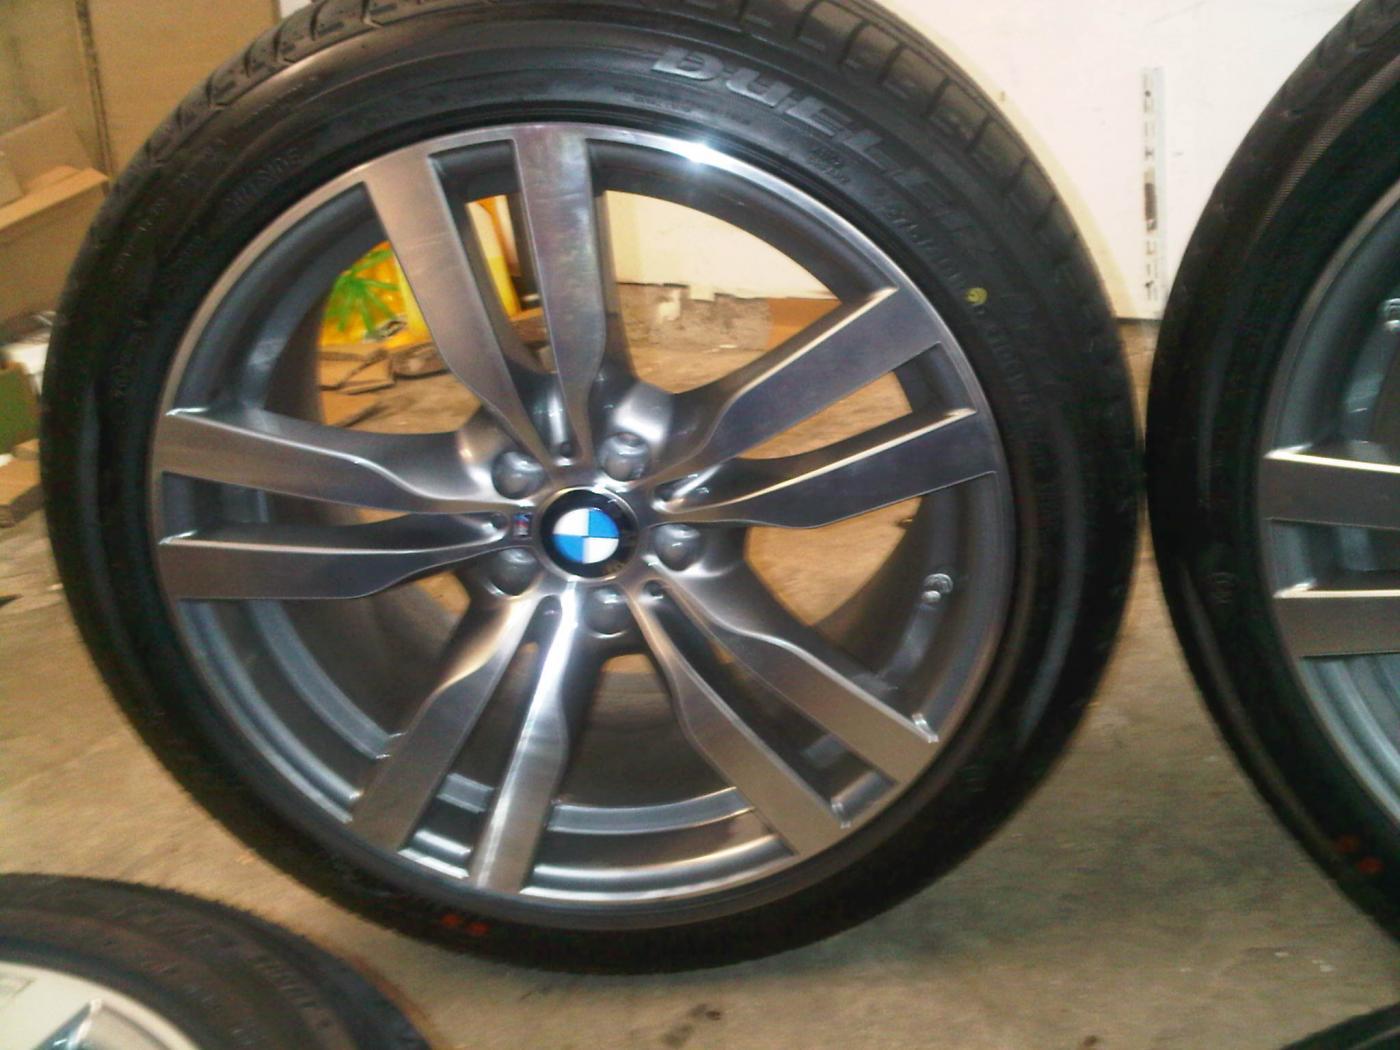 Brand New Take Offs 2012 Bmw X6m Wheels With Tires